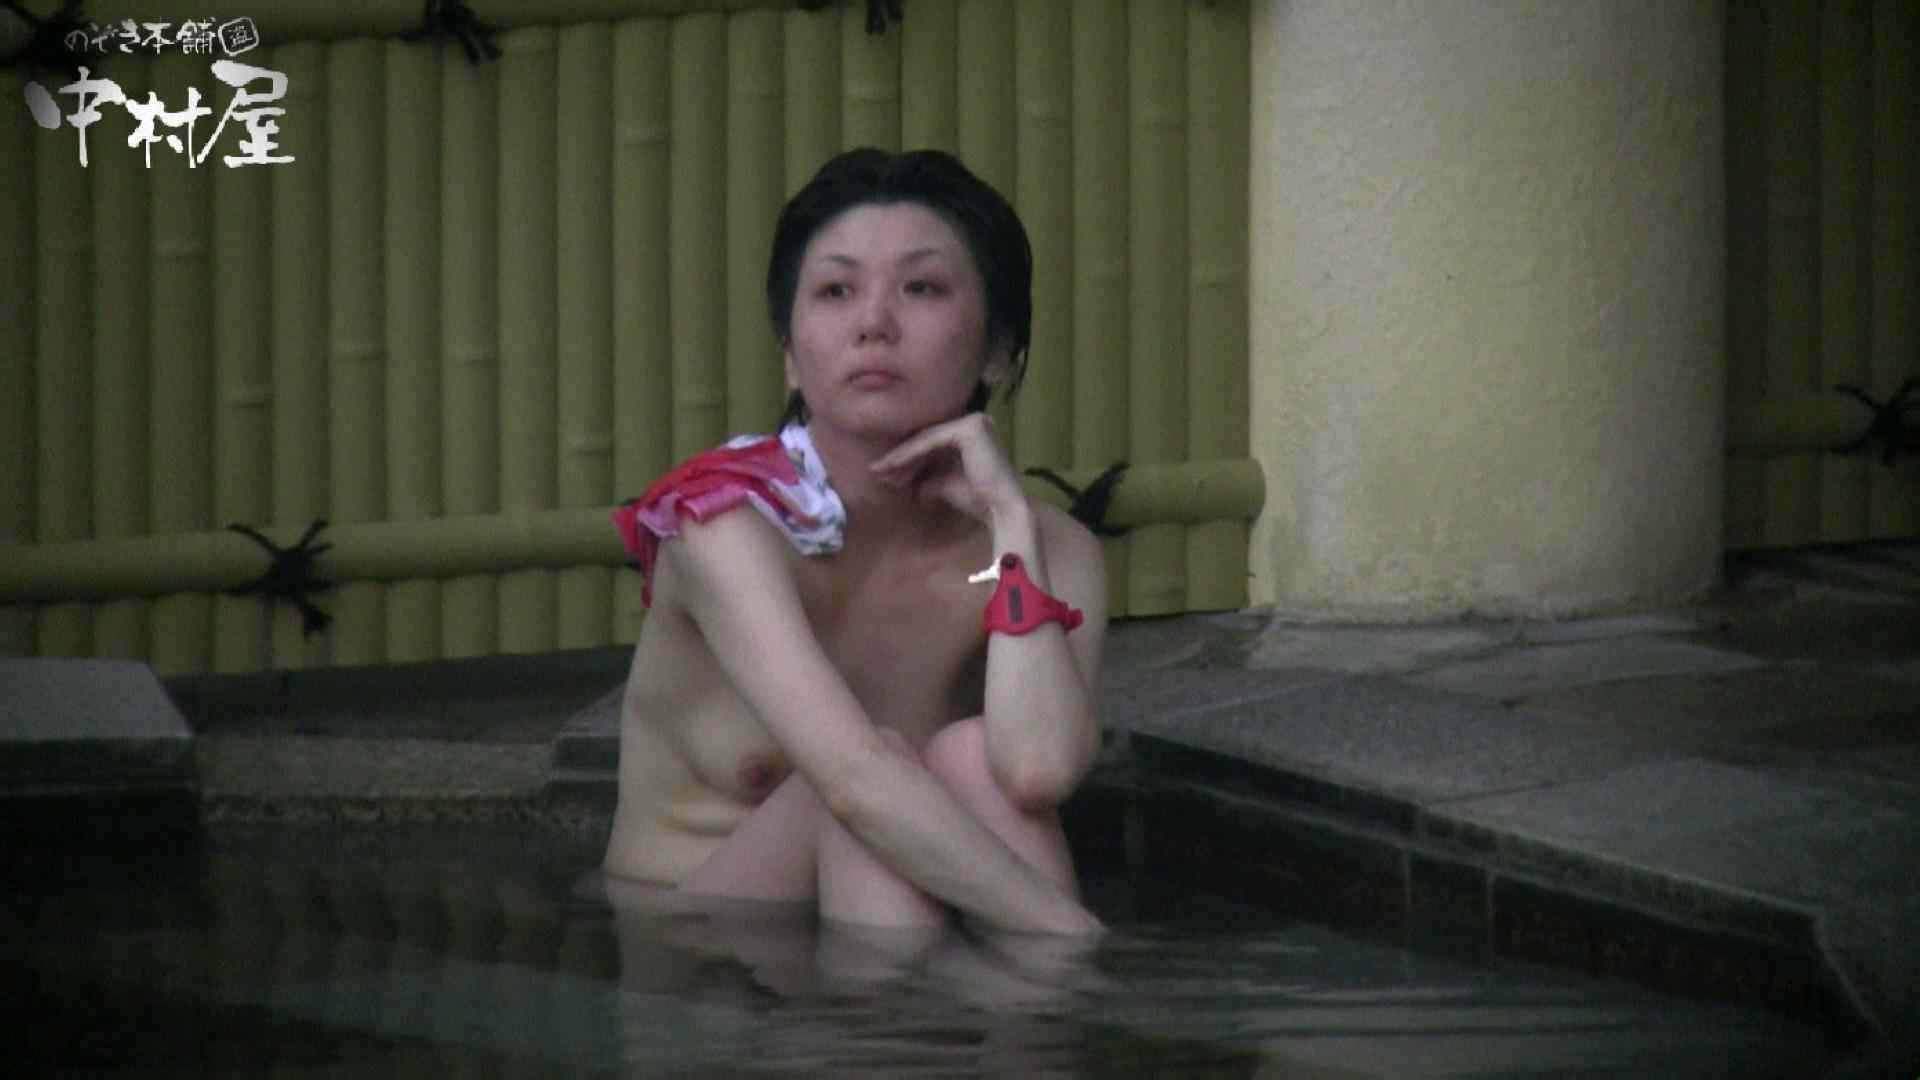 Aquaな露天風呂Vol.884 盗撮師作品  92pic 81